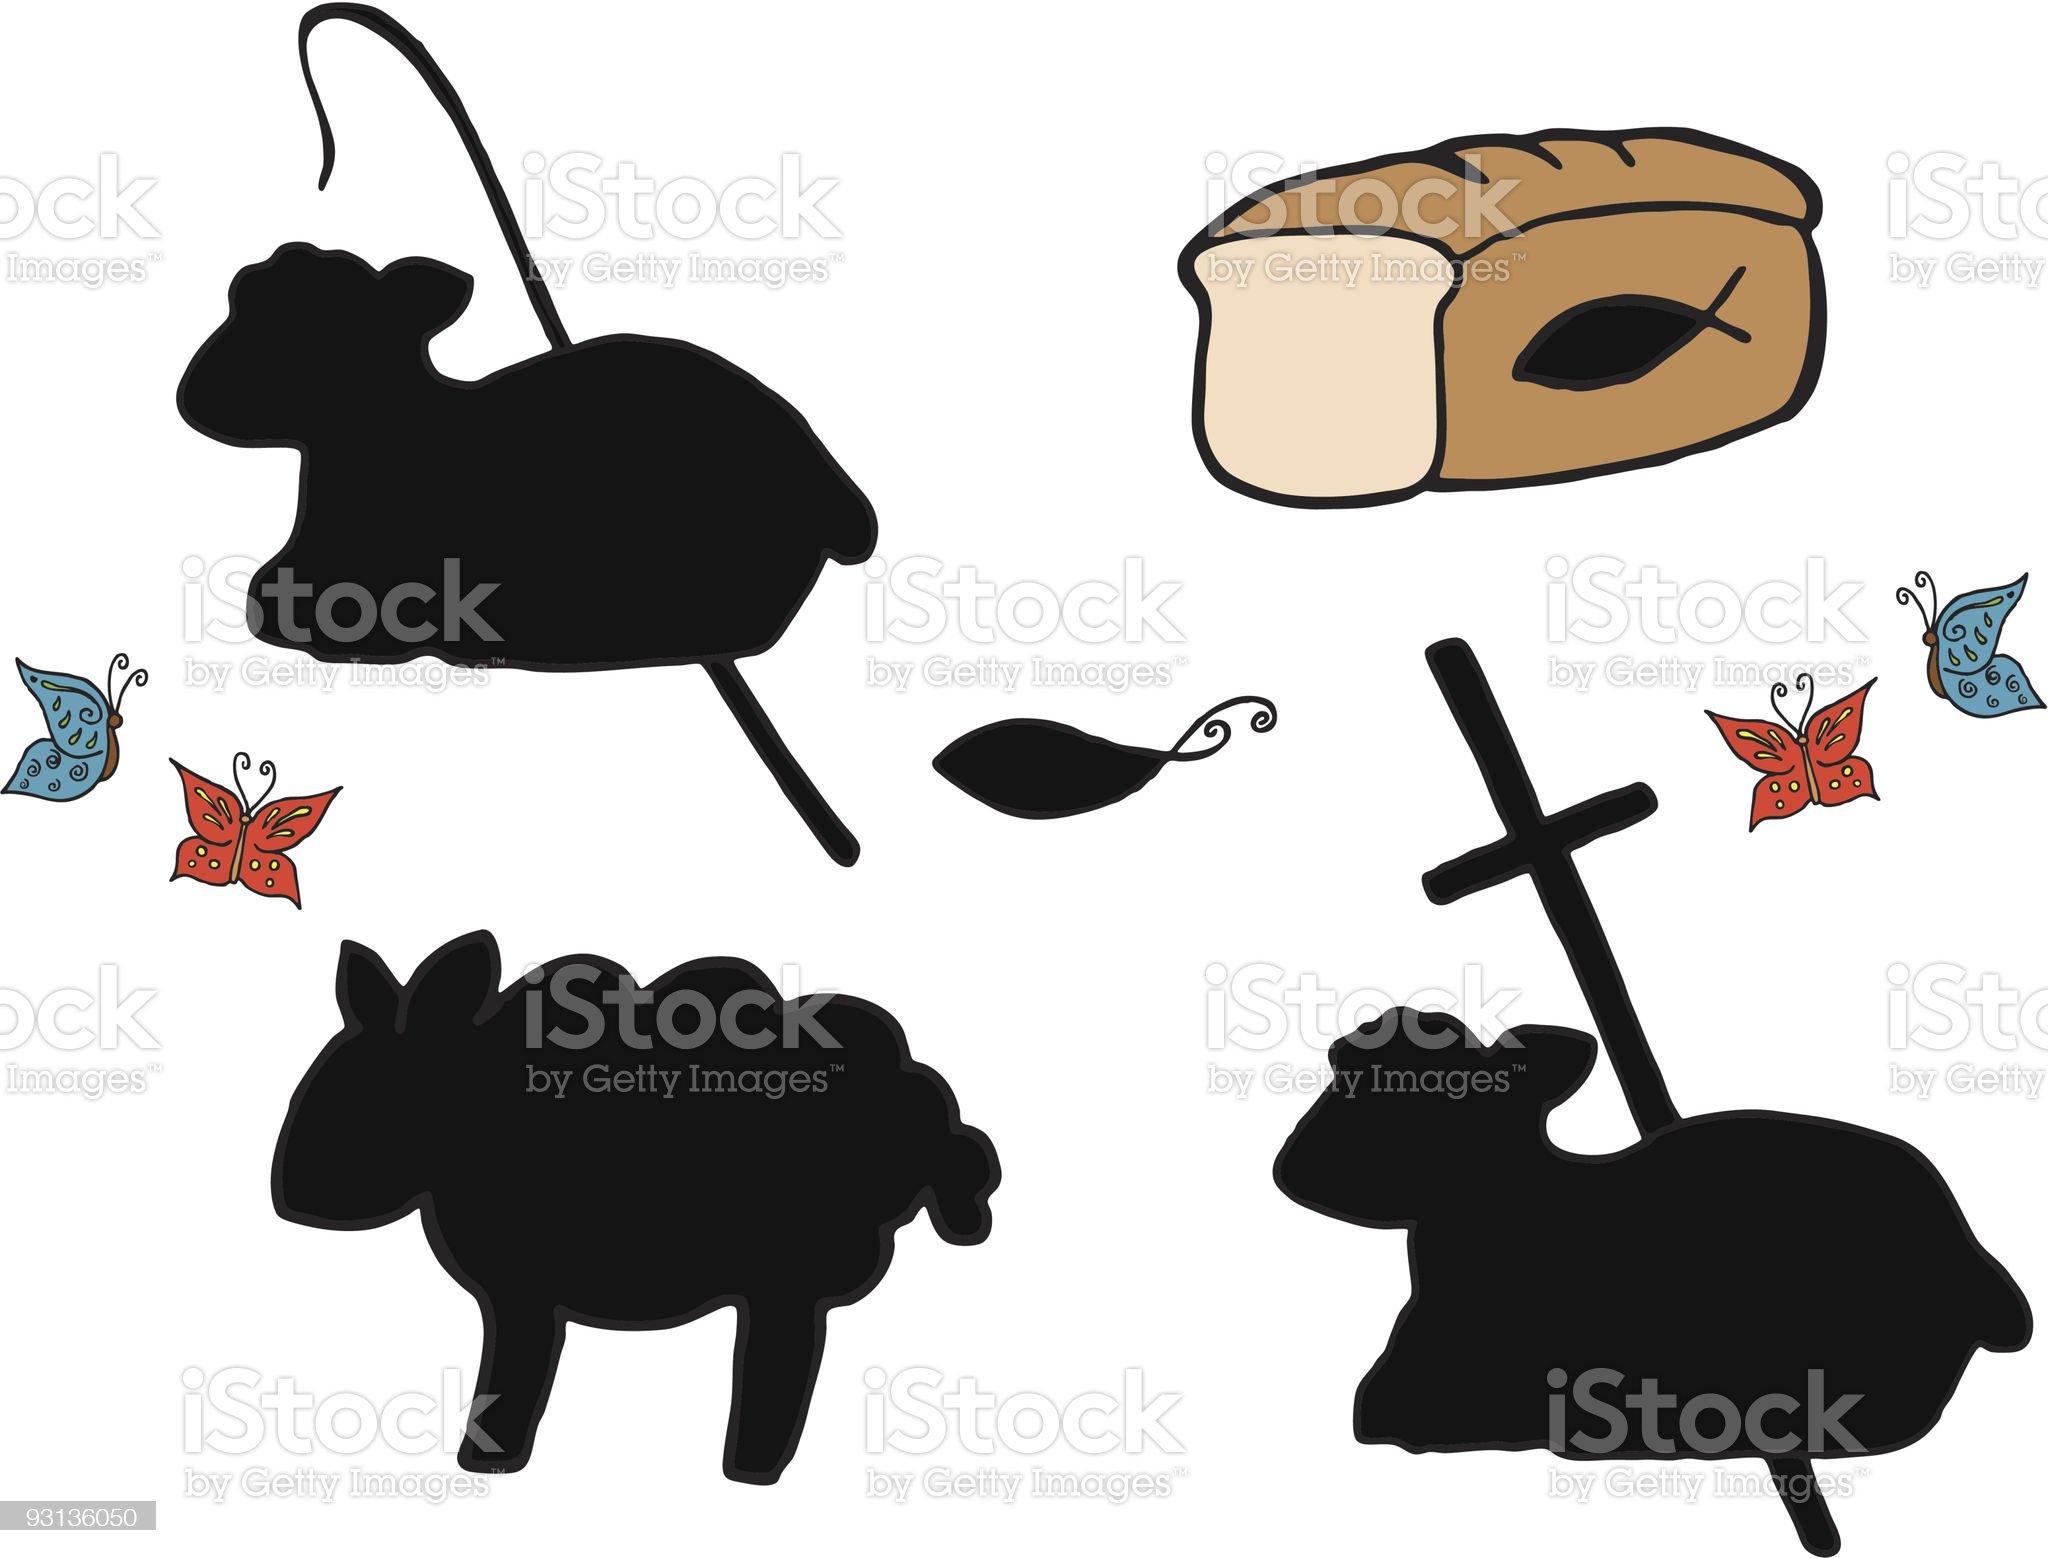 christian symbols royalty-free stock vector art